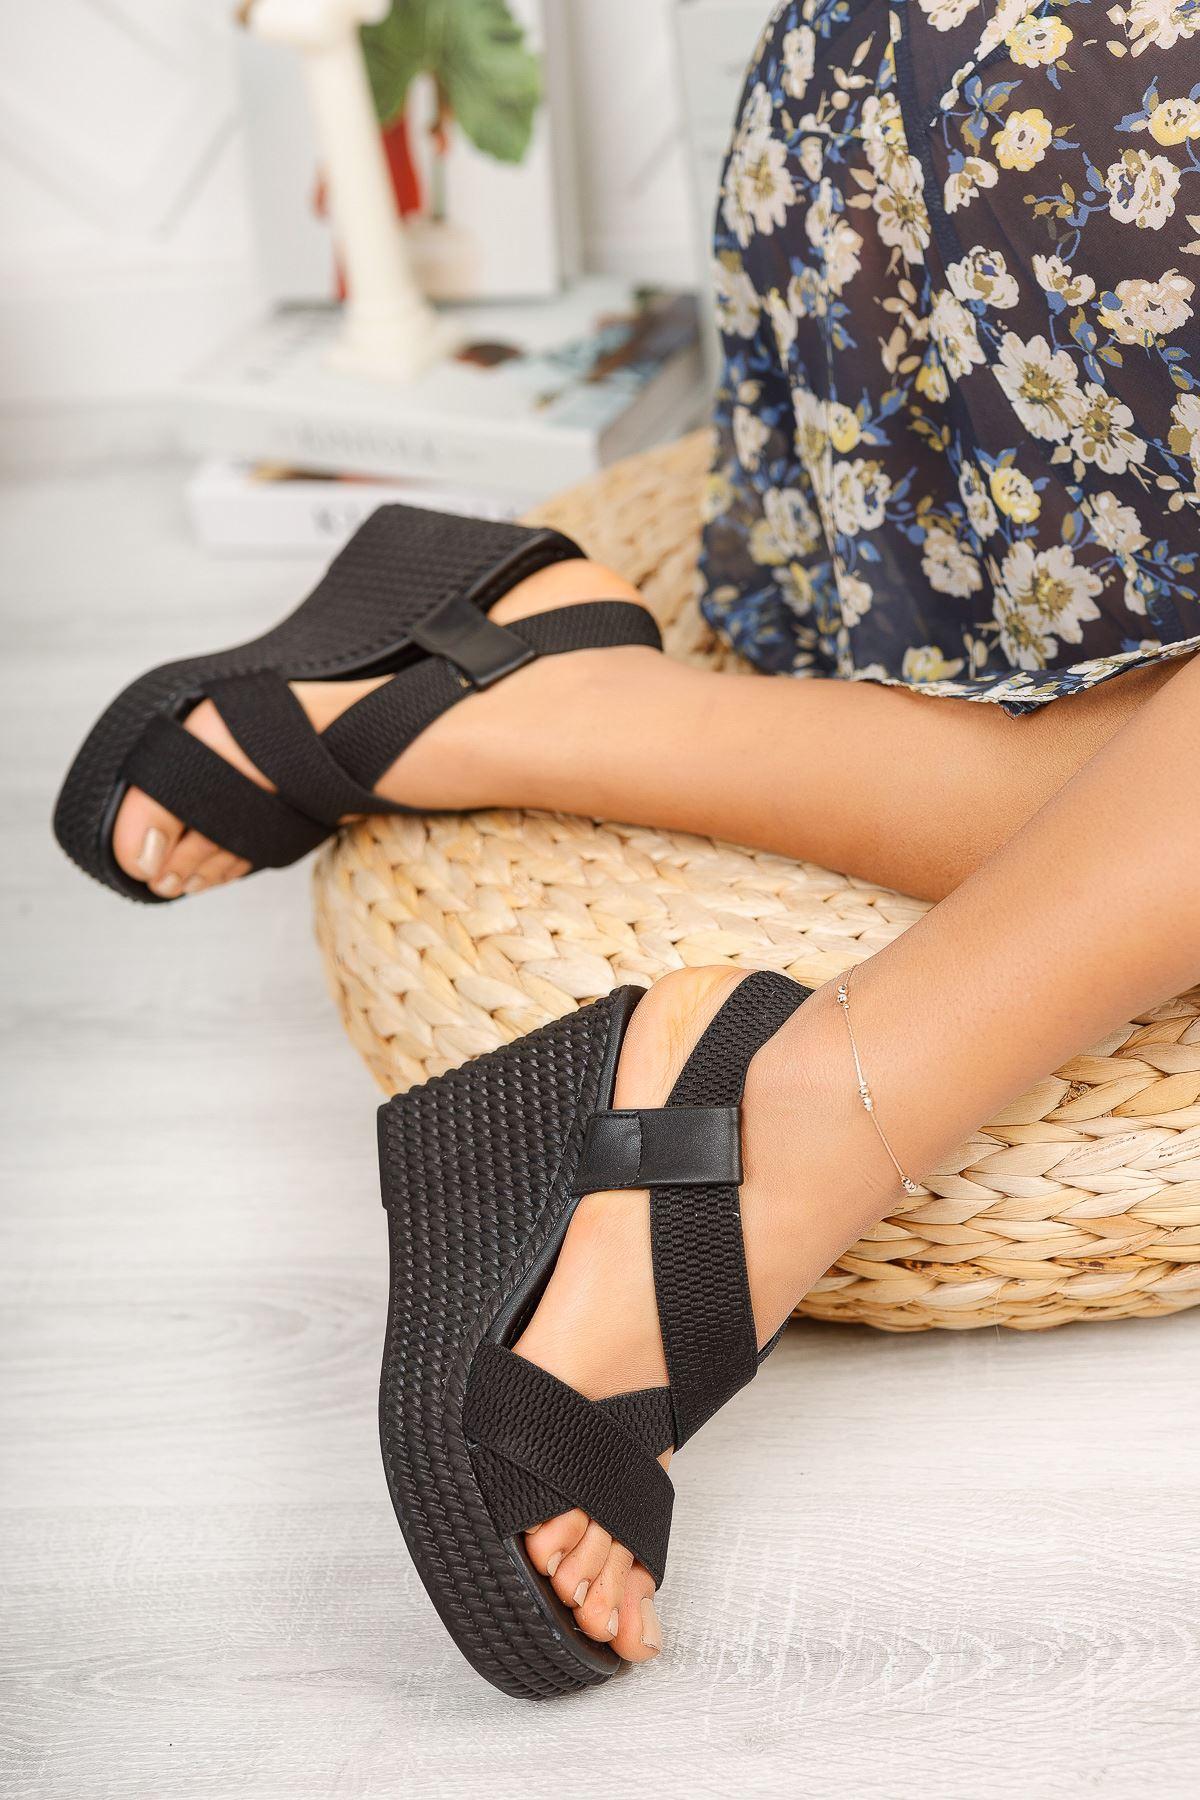 Siyah Lastikli Yüksek Dolgu Topuklu Ayakkabı